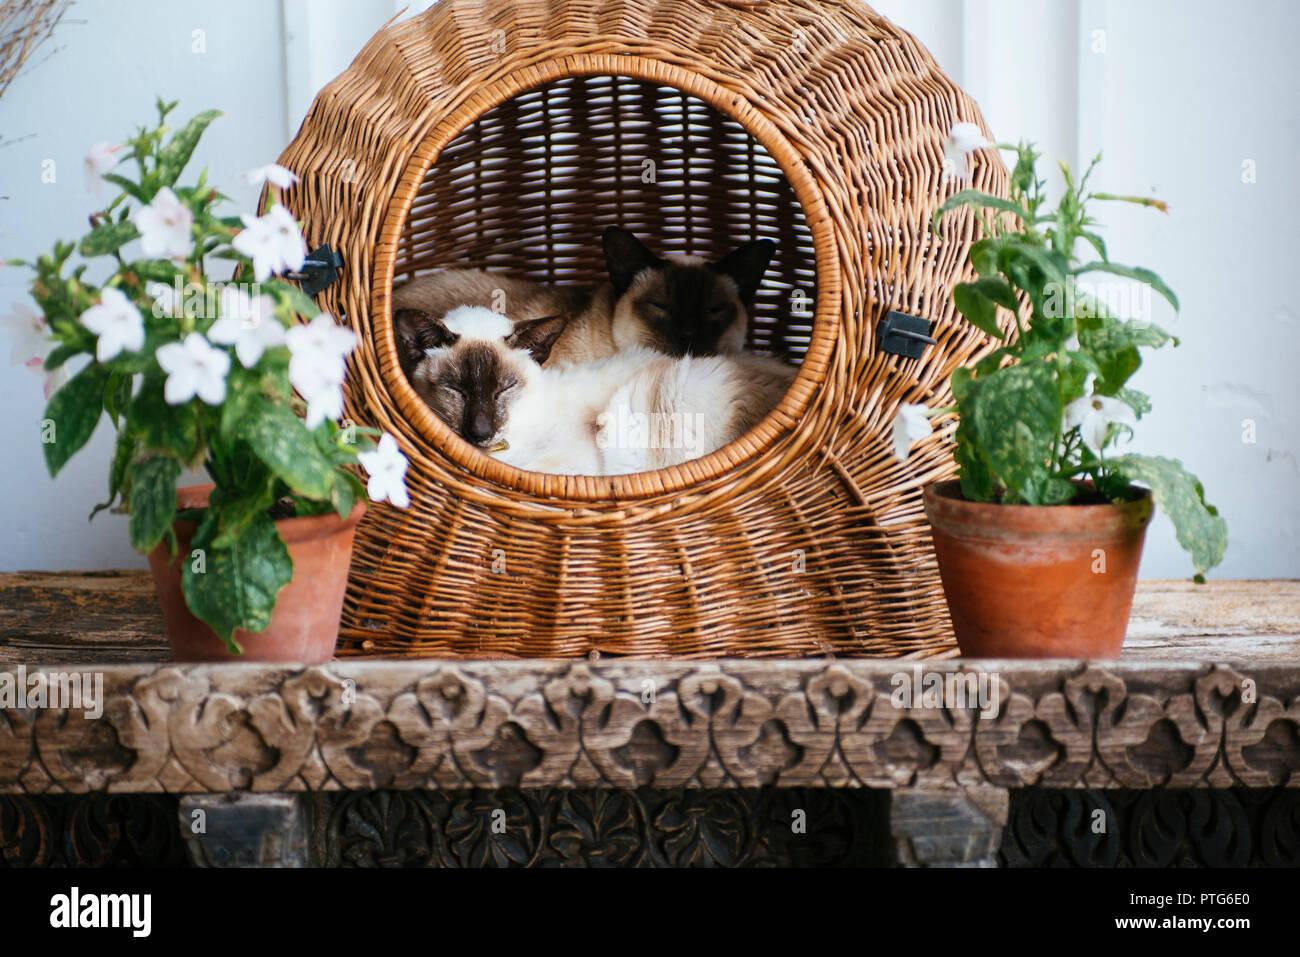 Siamese twin cats in wicker basket Stock Photo